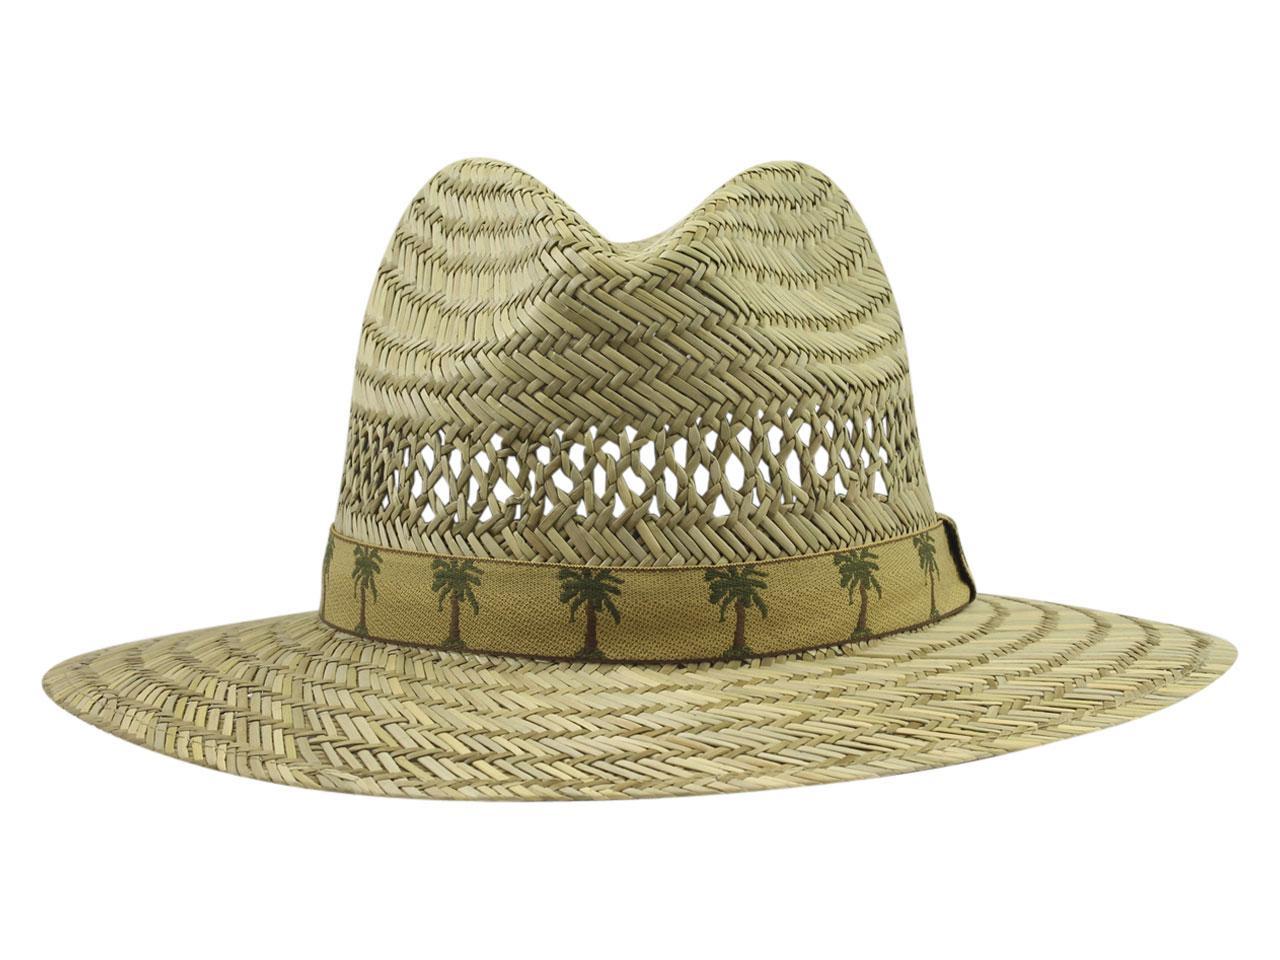 caa6af7b855b6 DPC Global Trends Men s Palm Tape Rush Safari Hat by Dorfman Pacific